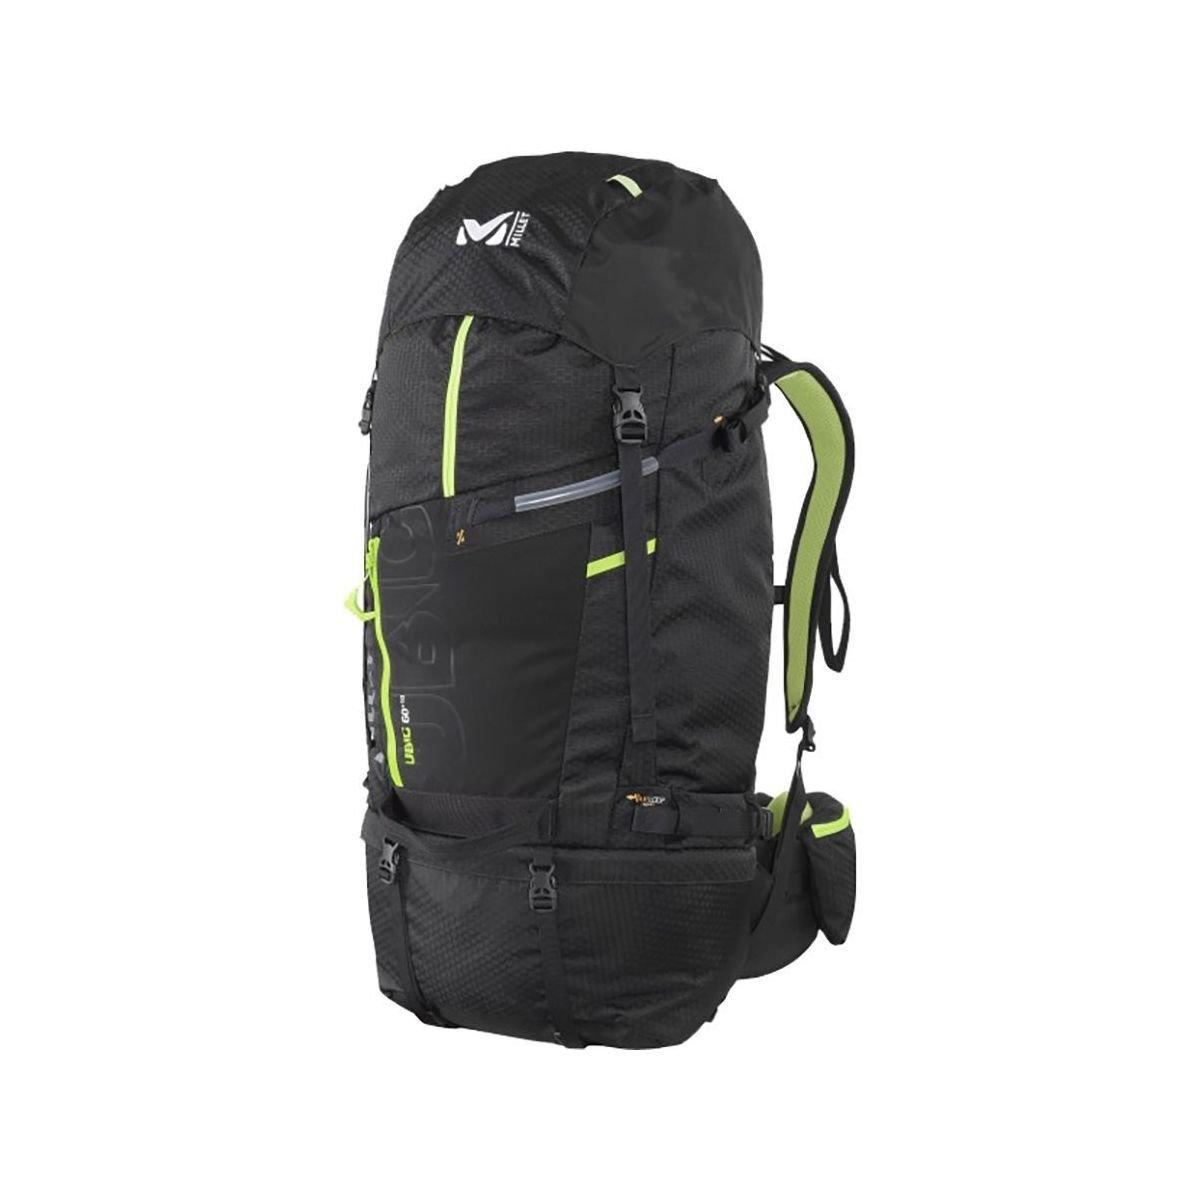 Outdoor Rucksack Millet Ubic 60+10L Backpack Outdoor-Tagesrucksäcke